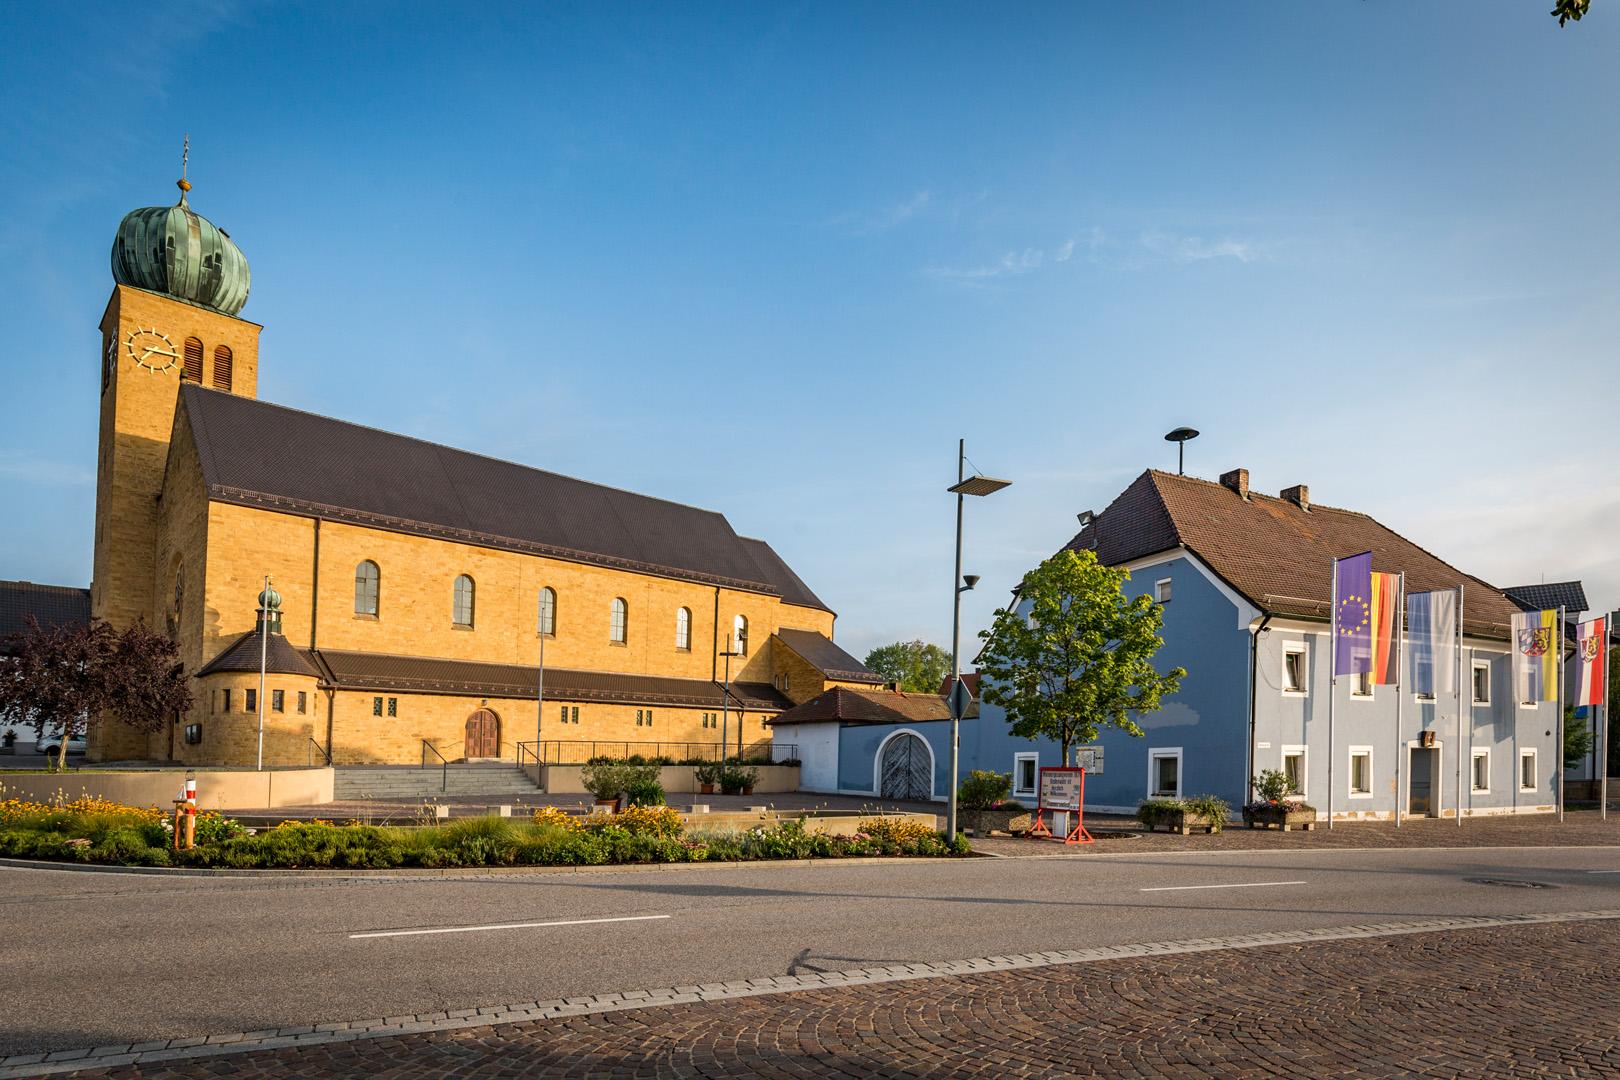 Marktplatz Bodenwöhr | © Thomas Kujat